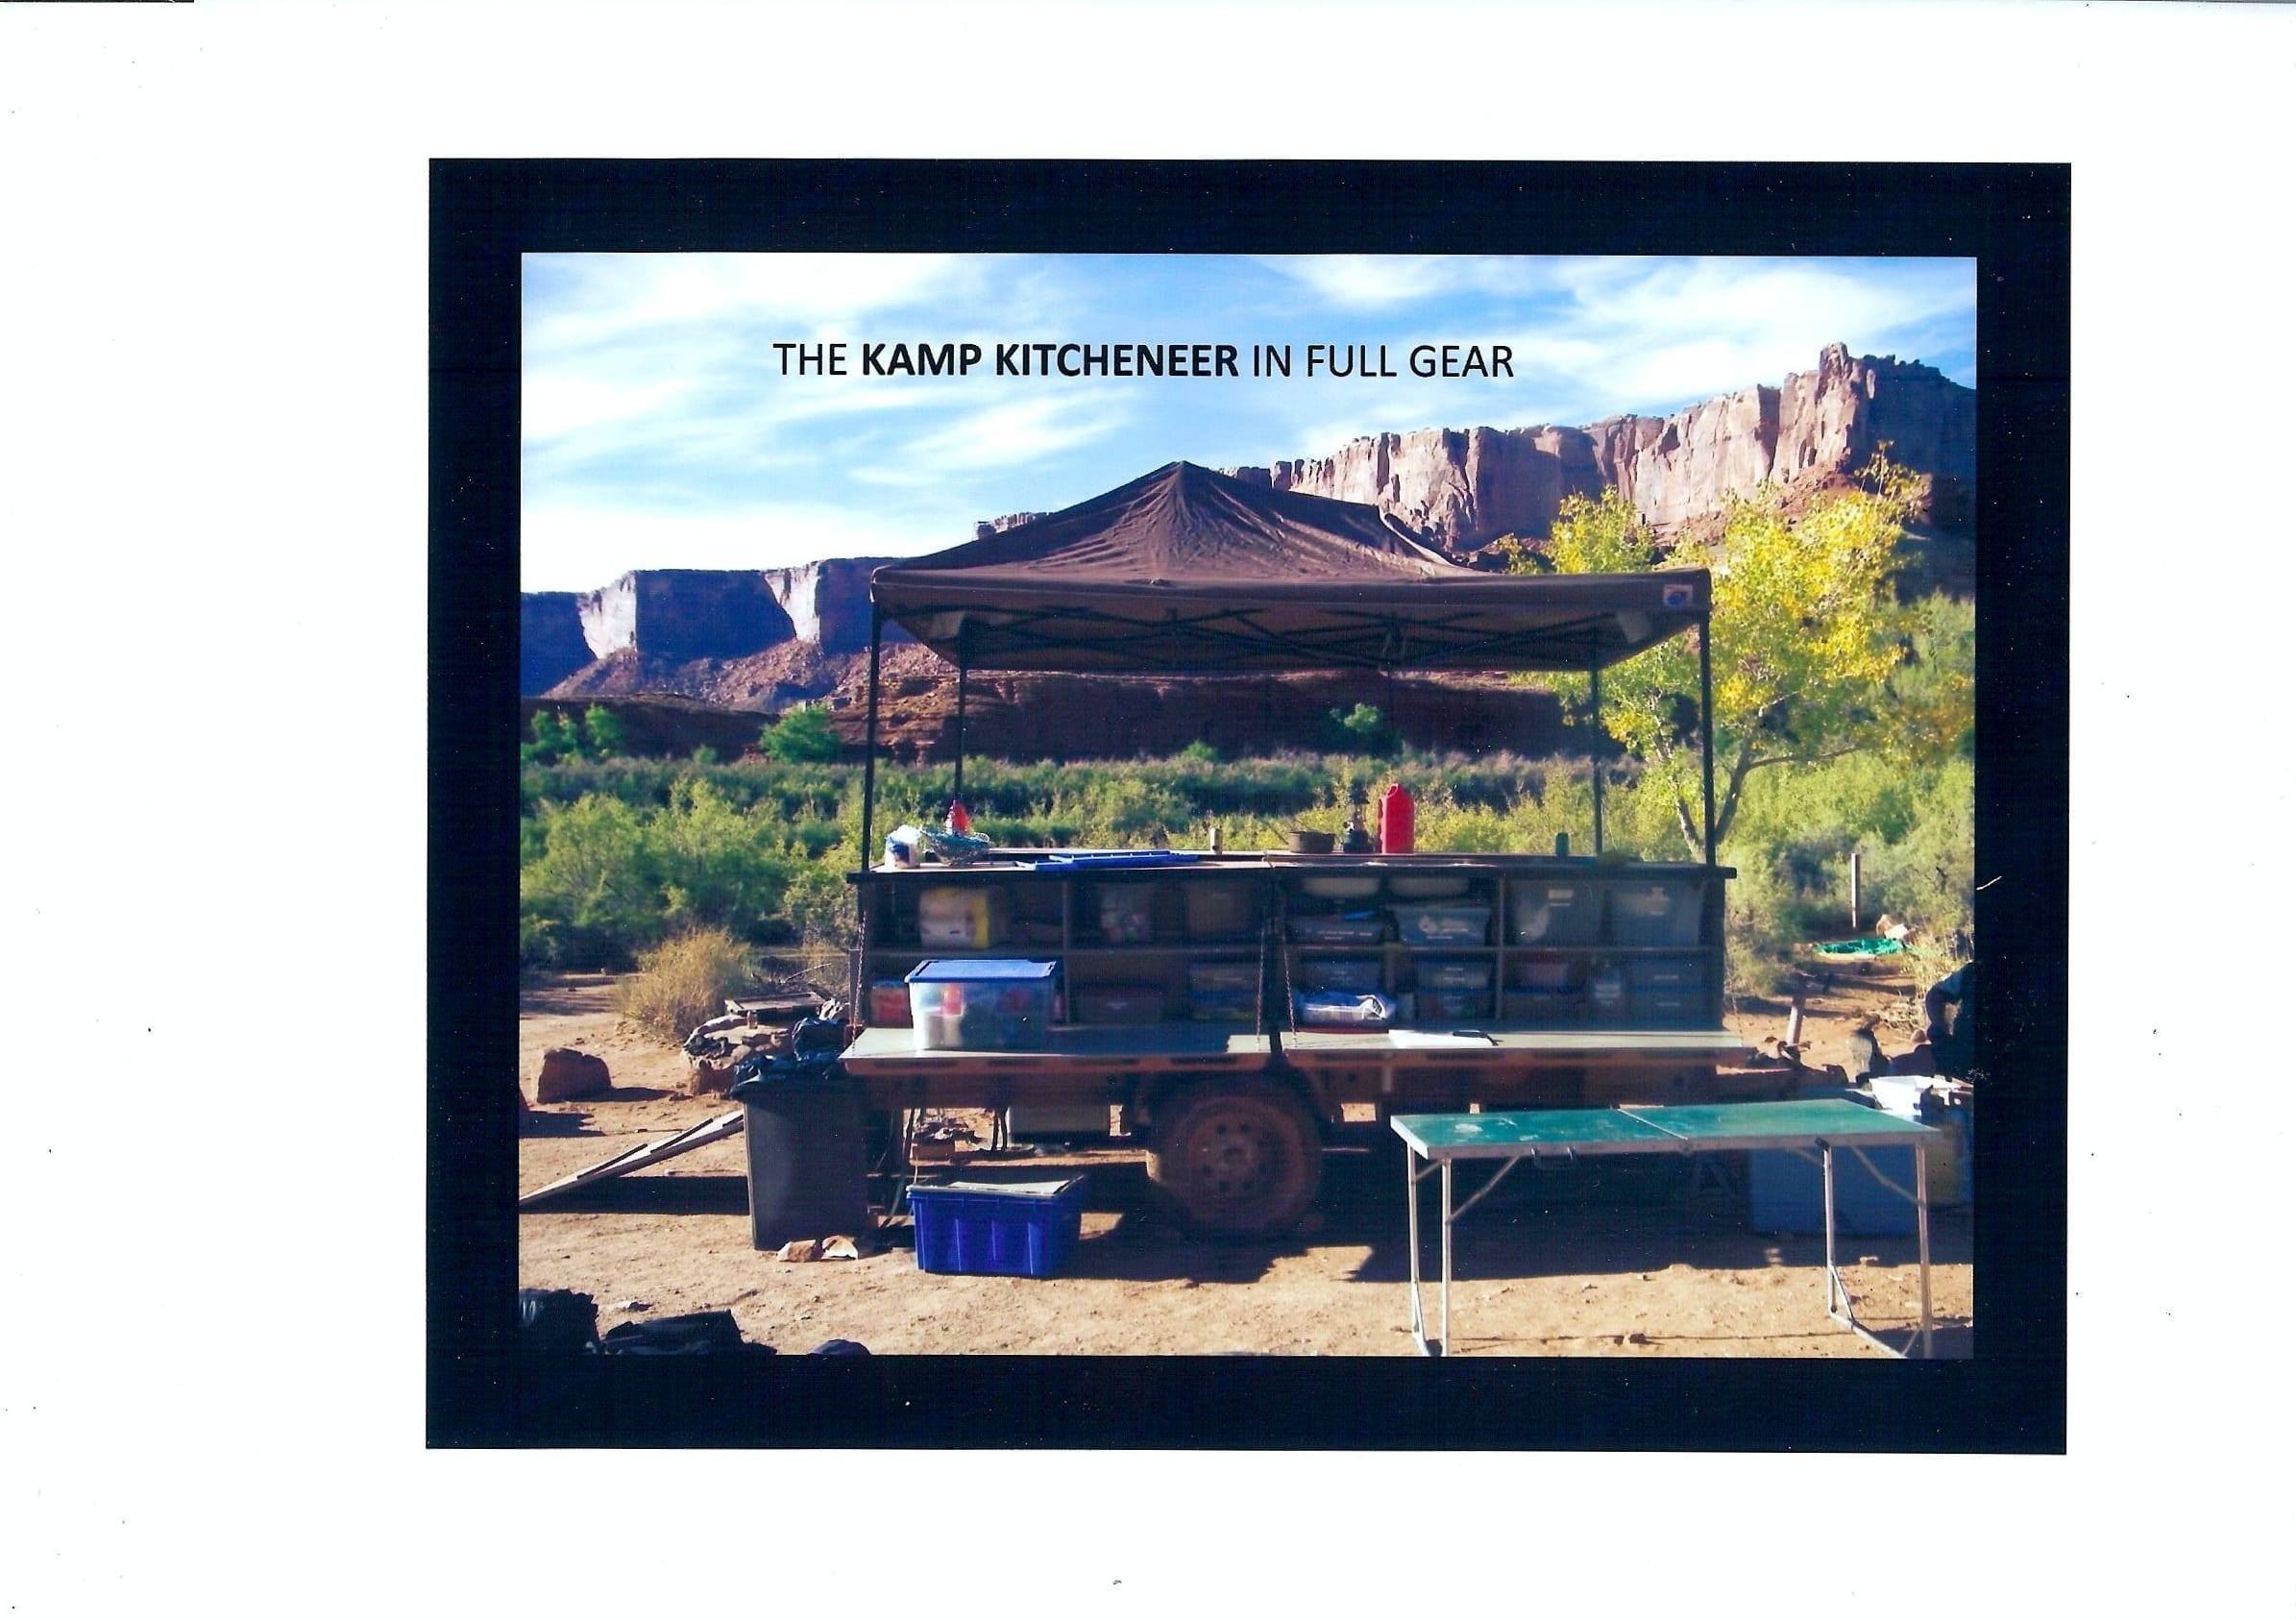 Kamp Kitcheneer In Full Gear. Private manufacturer Kamp Kitcheneer Off Road Kitchen Trailer 2016